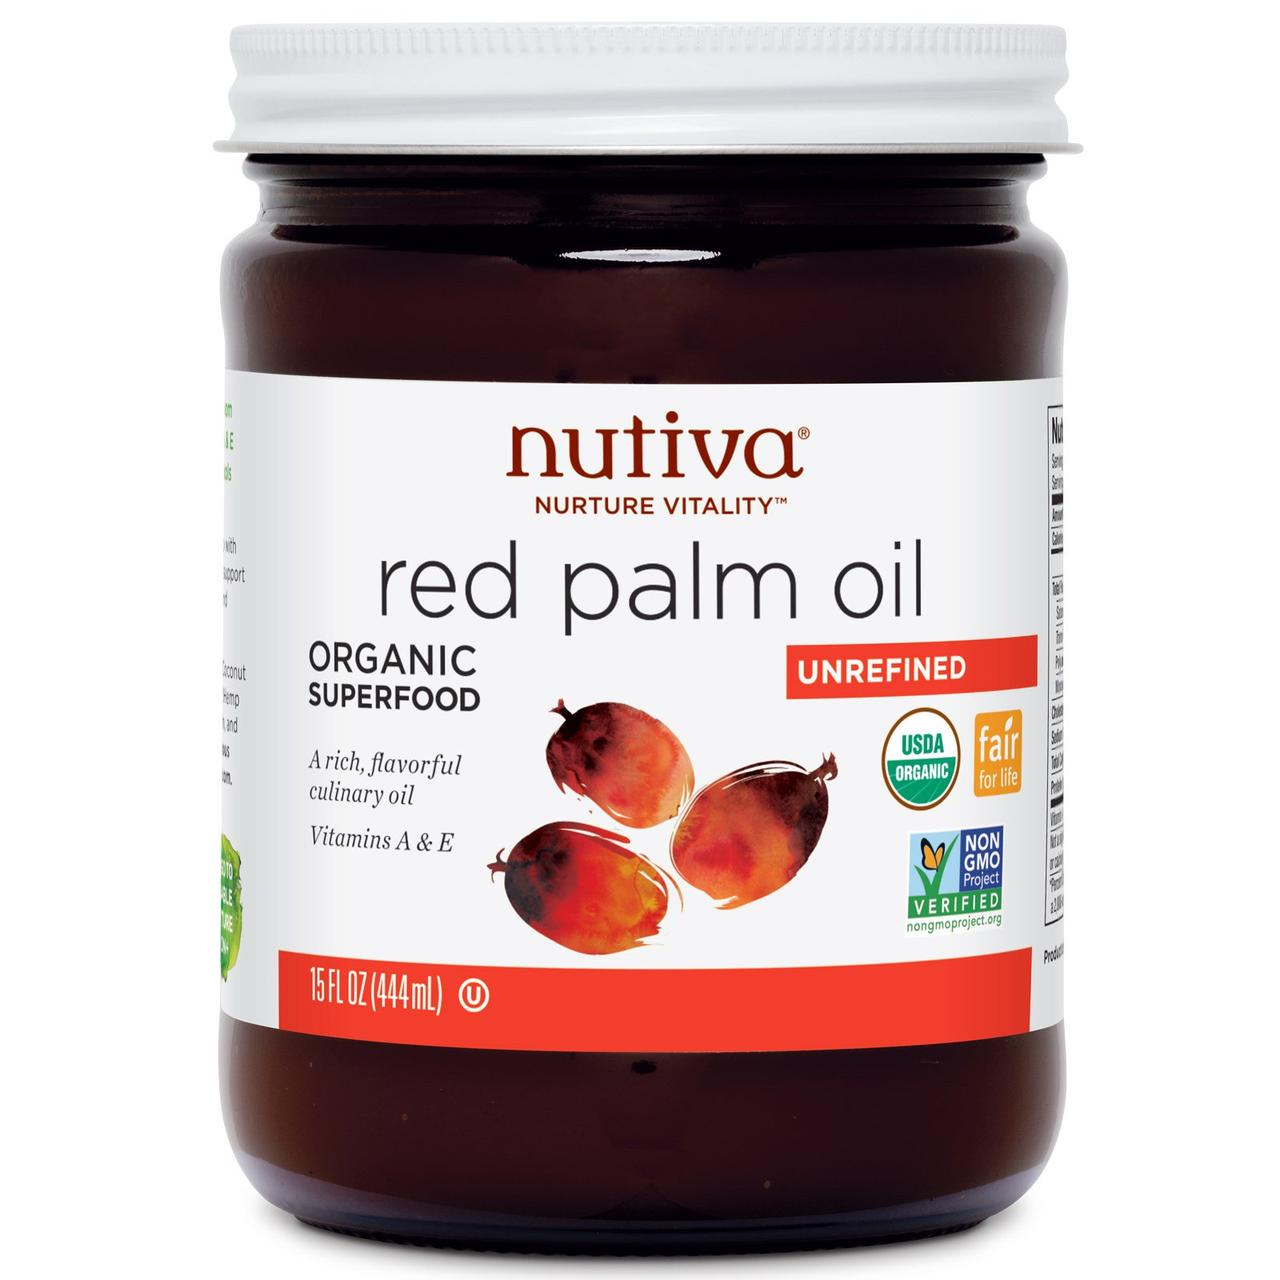 Червоне пальмове масло, Red Palm Oil, Nutiva, 444 мл